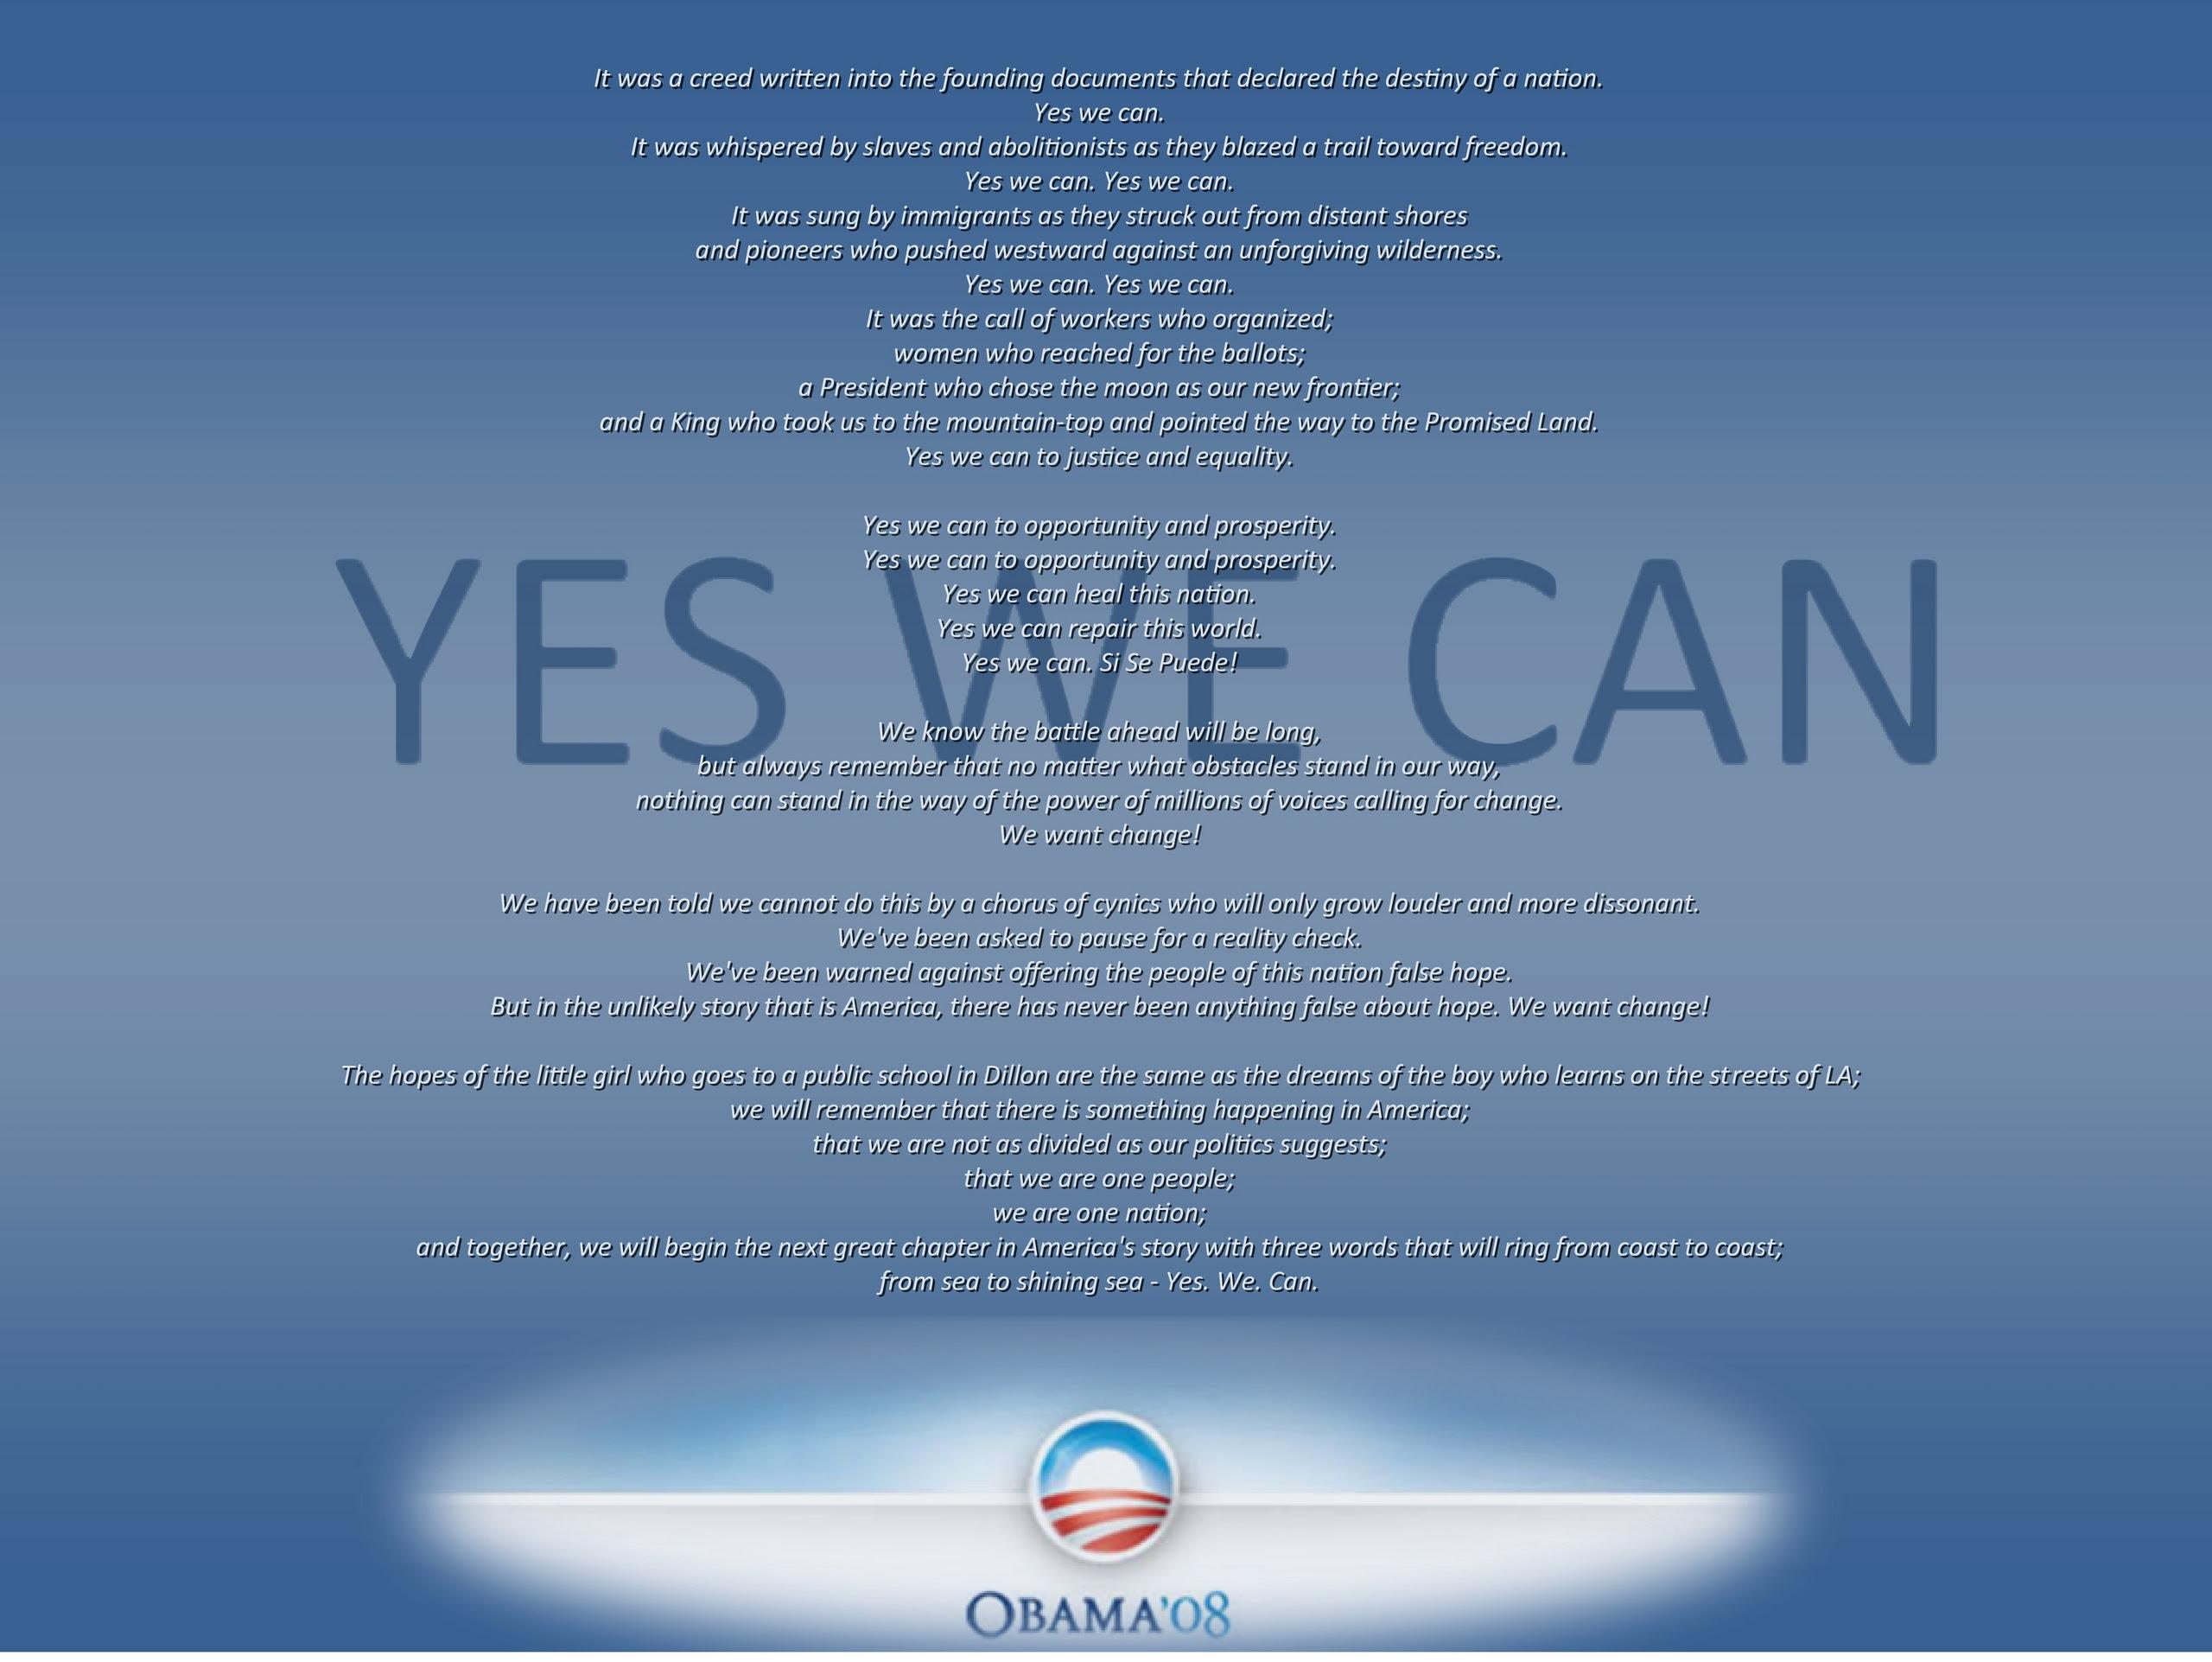 http://images1.fanpop.com/images/photos/1300000/Yes-We-Can-Obama-08-Wallpaper-1400x1050-barack-obama-1319340-2560-1923.jpg